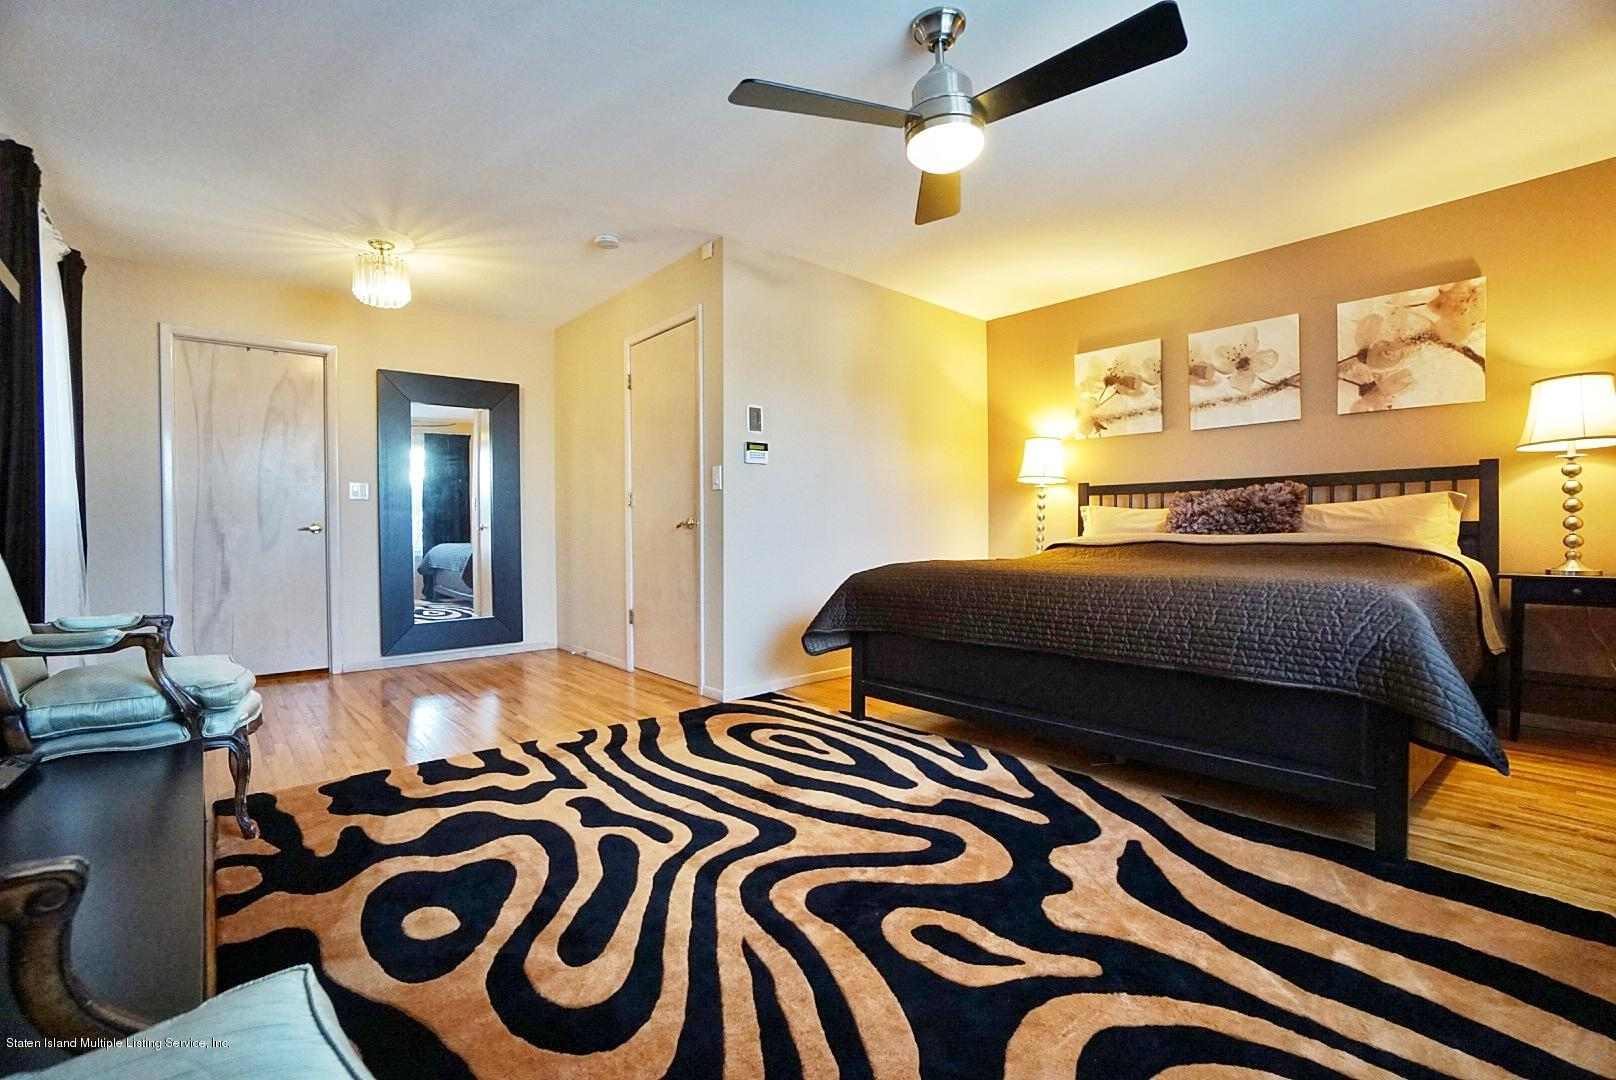 Single Family - Detached 183 Kensington Avenue  Staten Island, NY 10305, MLS-1127107-20